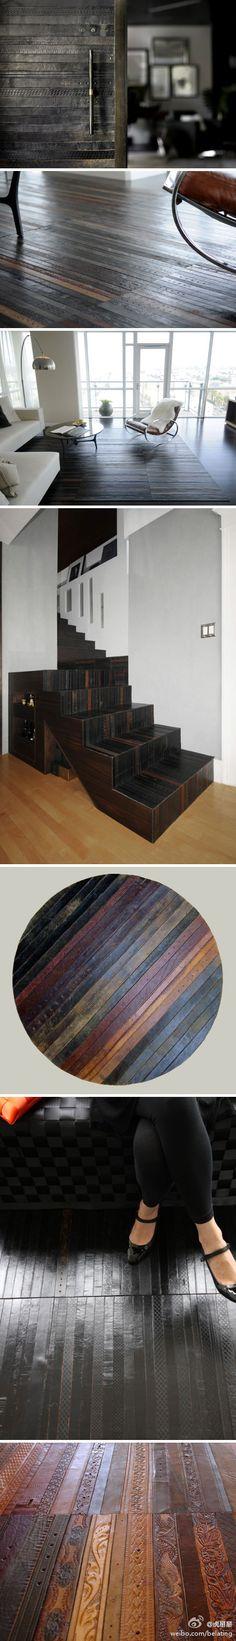 29 Best Leather Floor Images On Pinterest Floors Tile Flooring